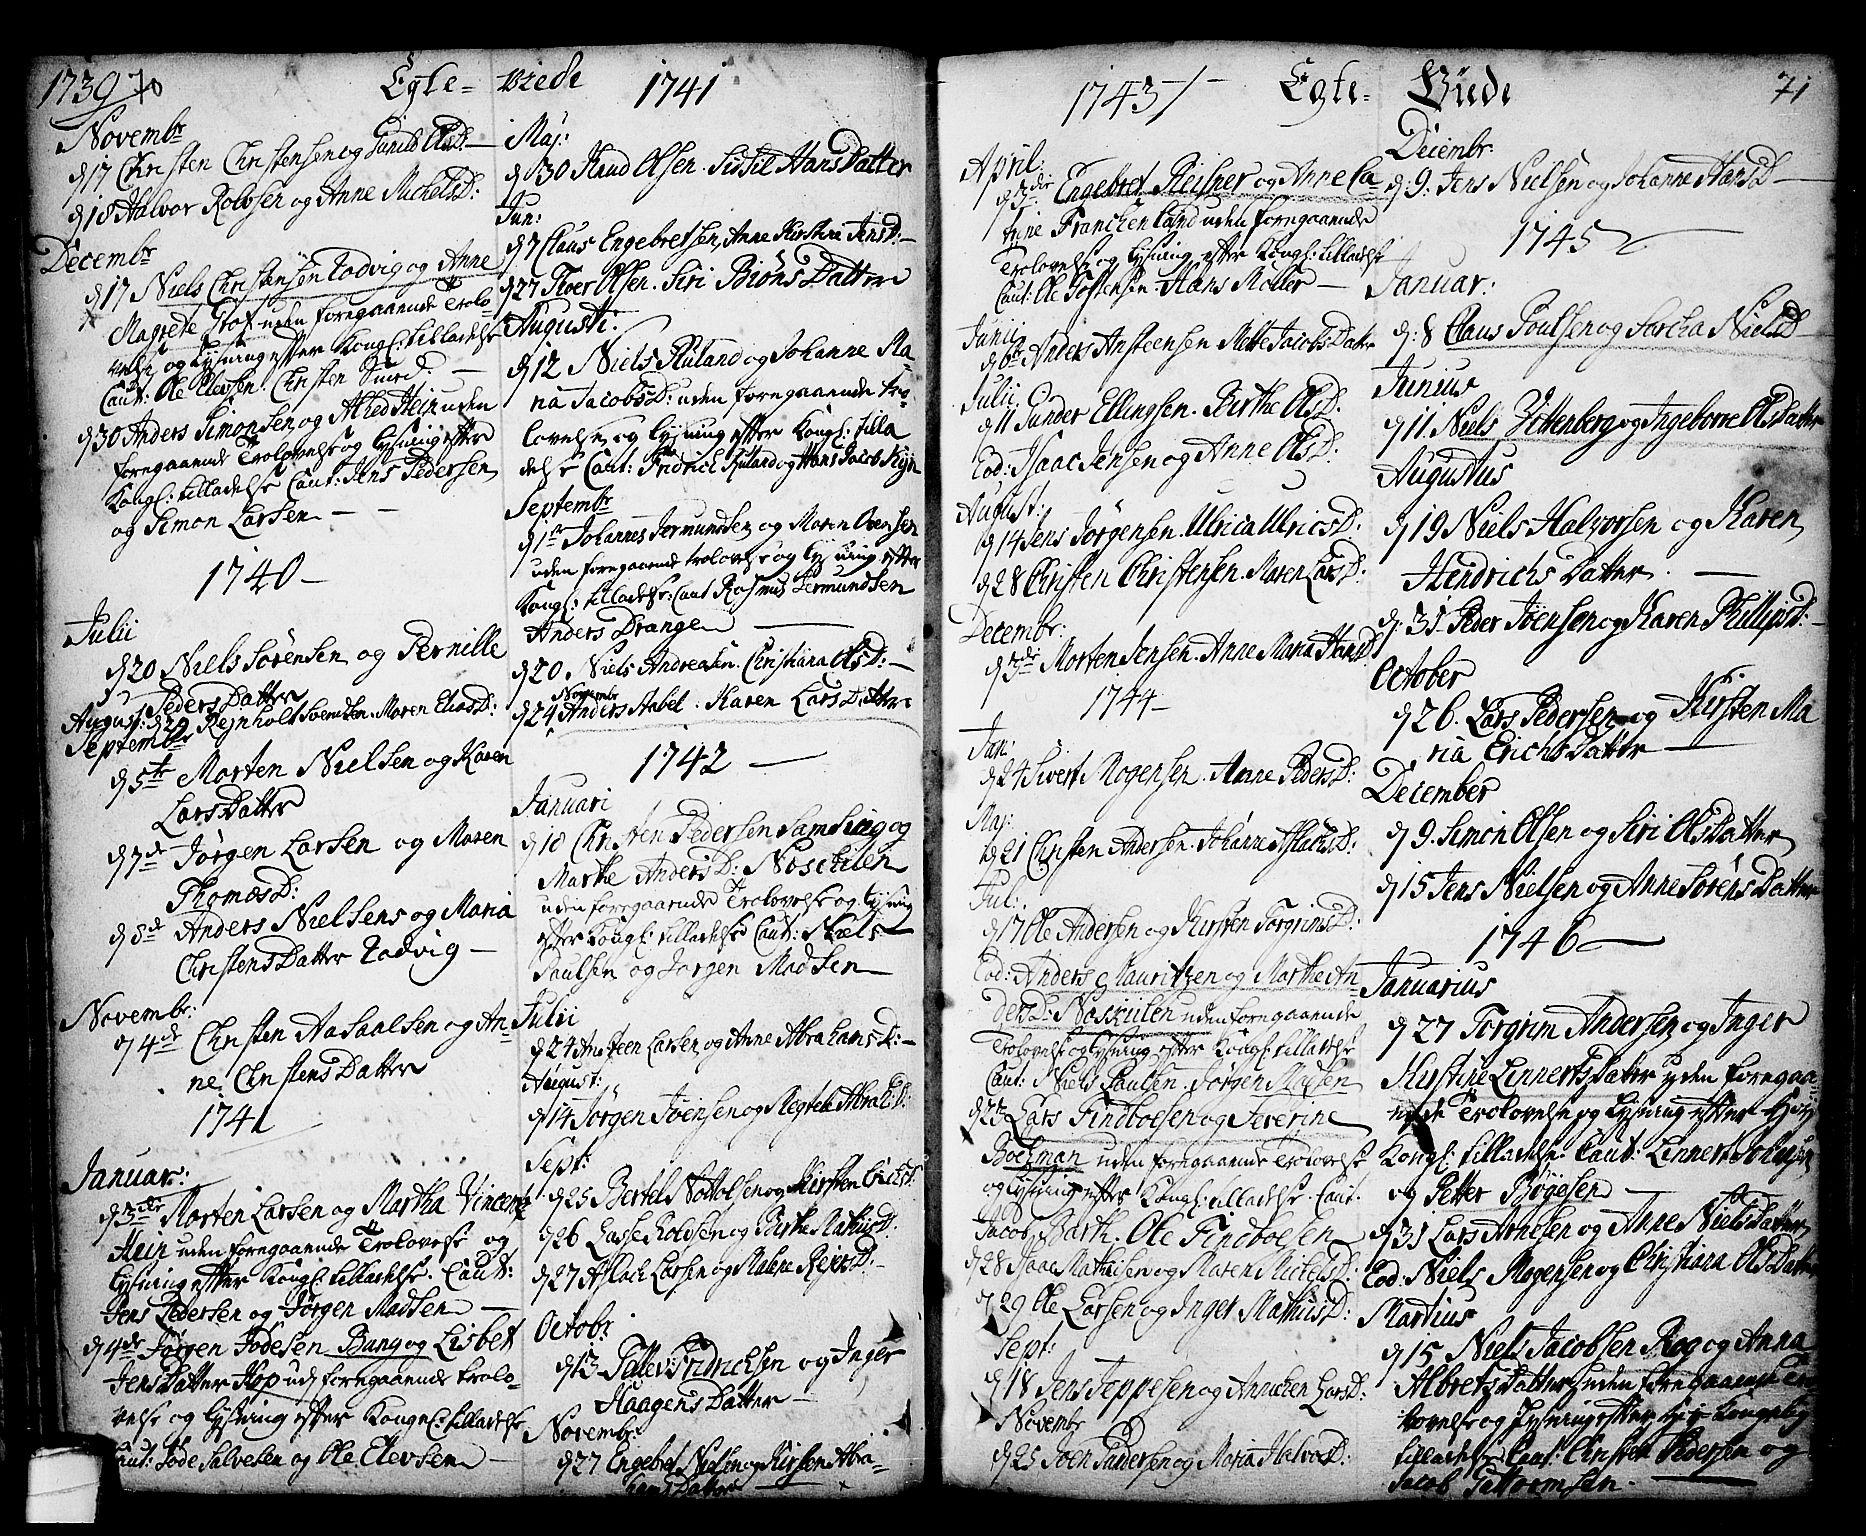 SAKO, Kragerø kirkebøker, F/Fa/L0001: Ministerialbok nr. 1, 1702-1766, s. 70-71